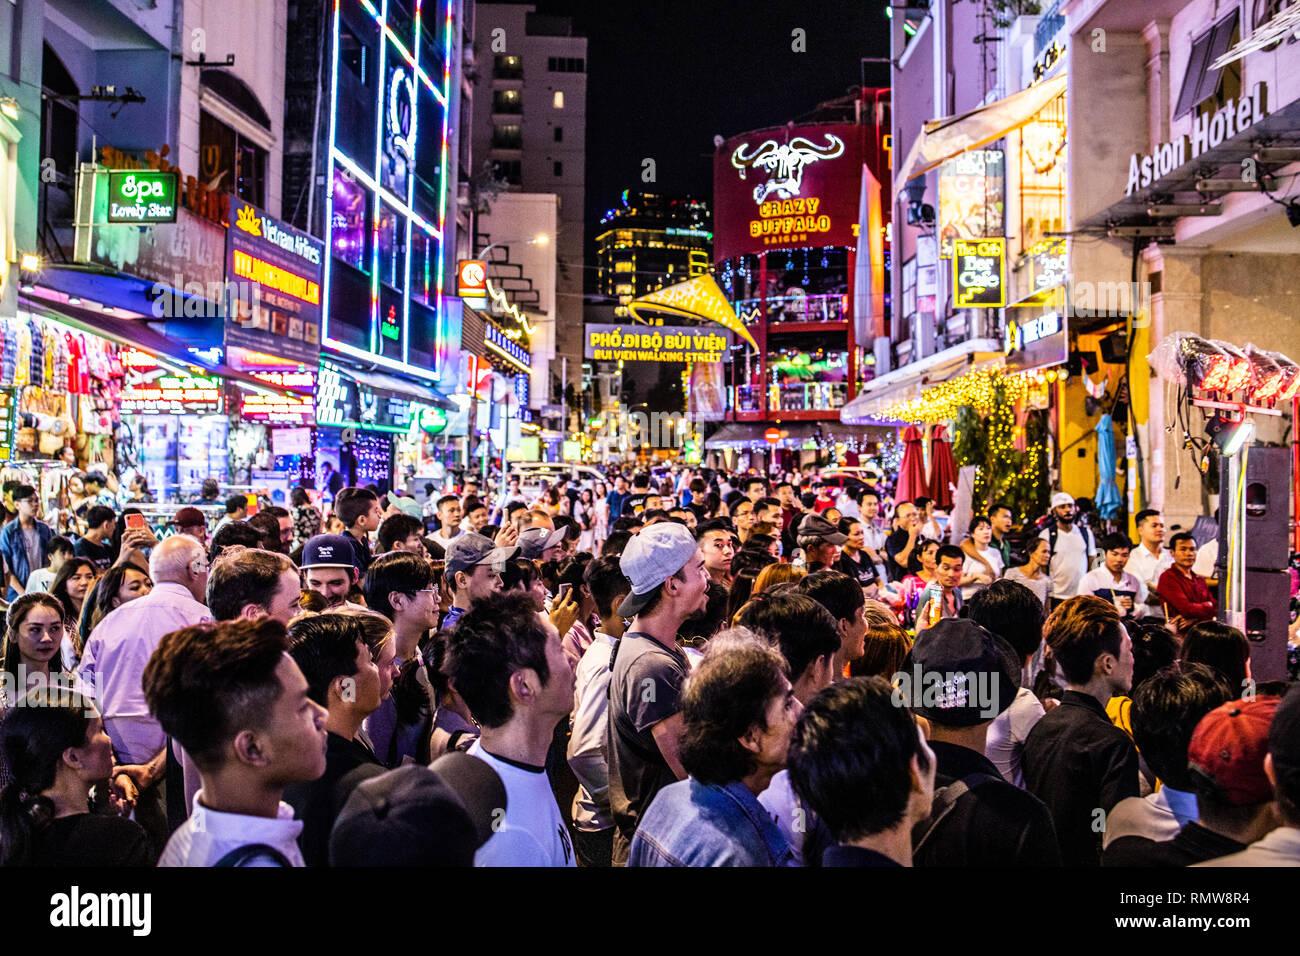 Pham Ngu Lao Area Nightlife Or Pho Tay Ho Chi Minh City Or Saigon Vietnam Stock Photo Alamy